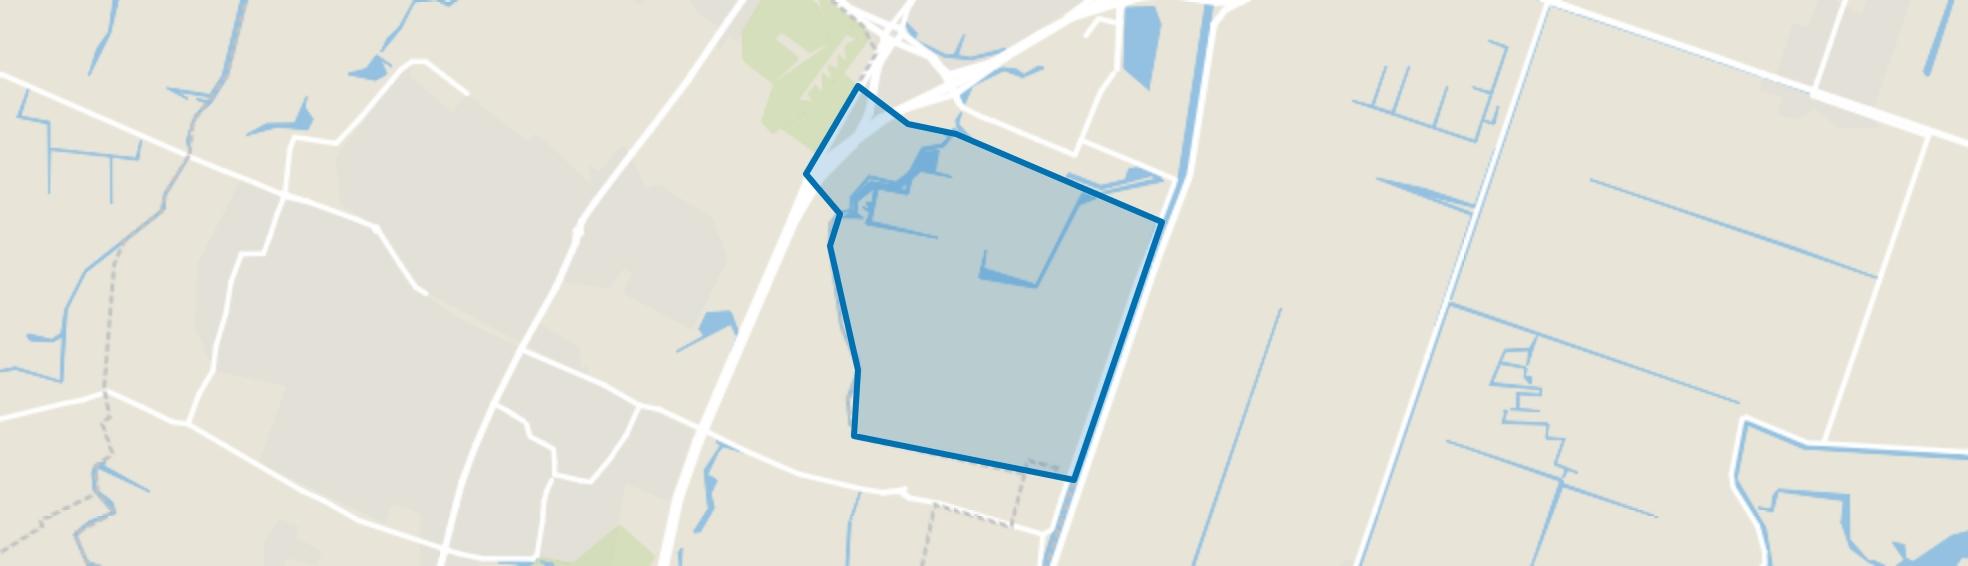 Boekelermeer-Zuid, Alkmaar map